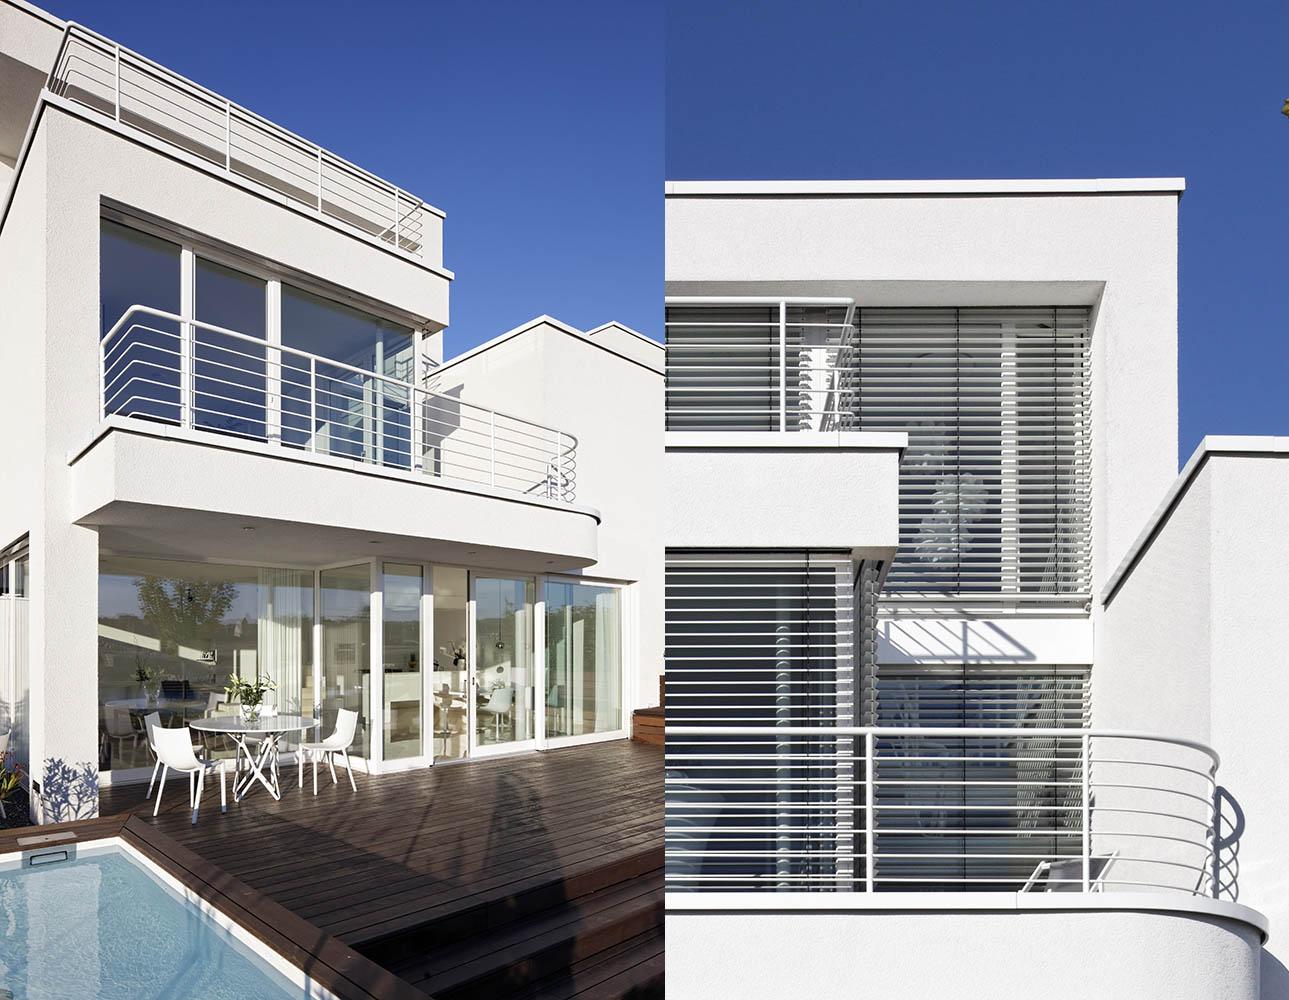 bielefeld architekten. Black Bedroom Furniture Sets. Home Design Ideas